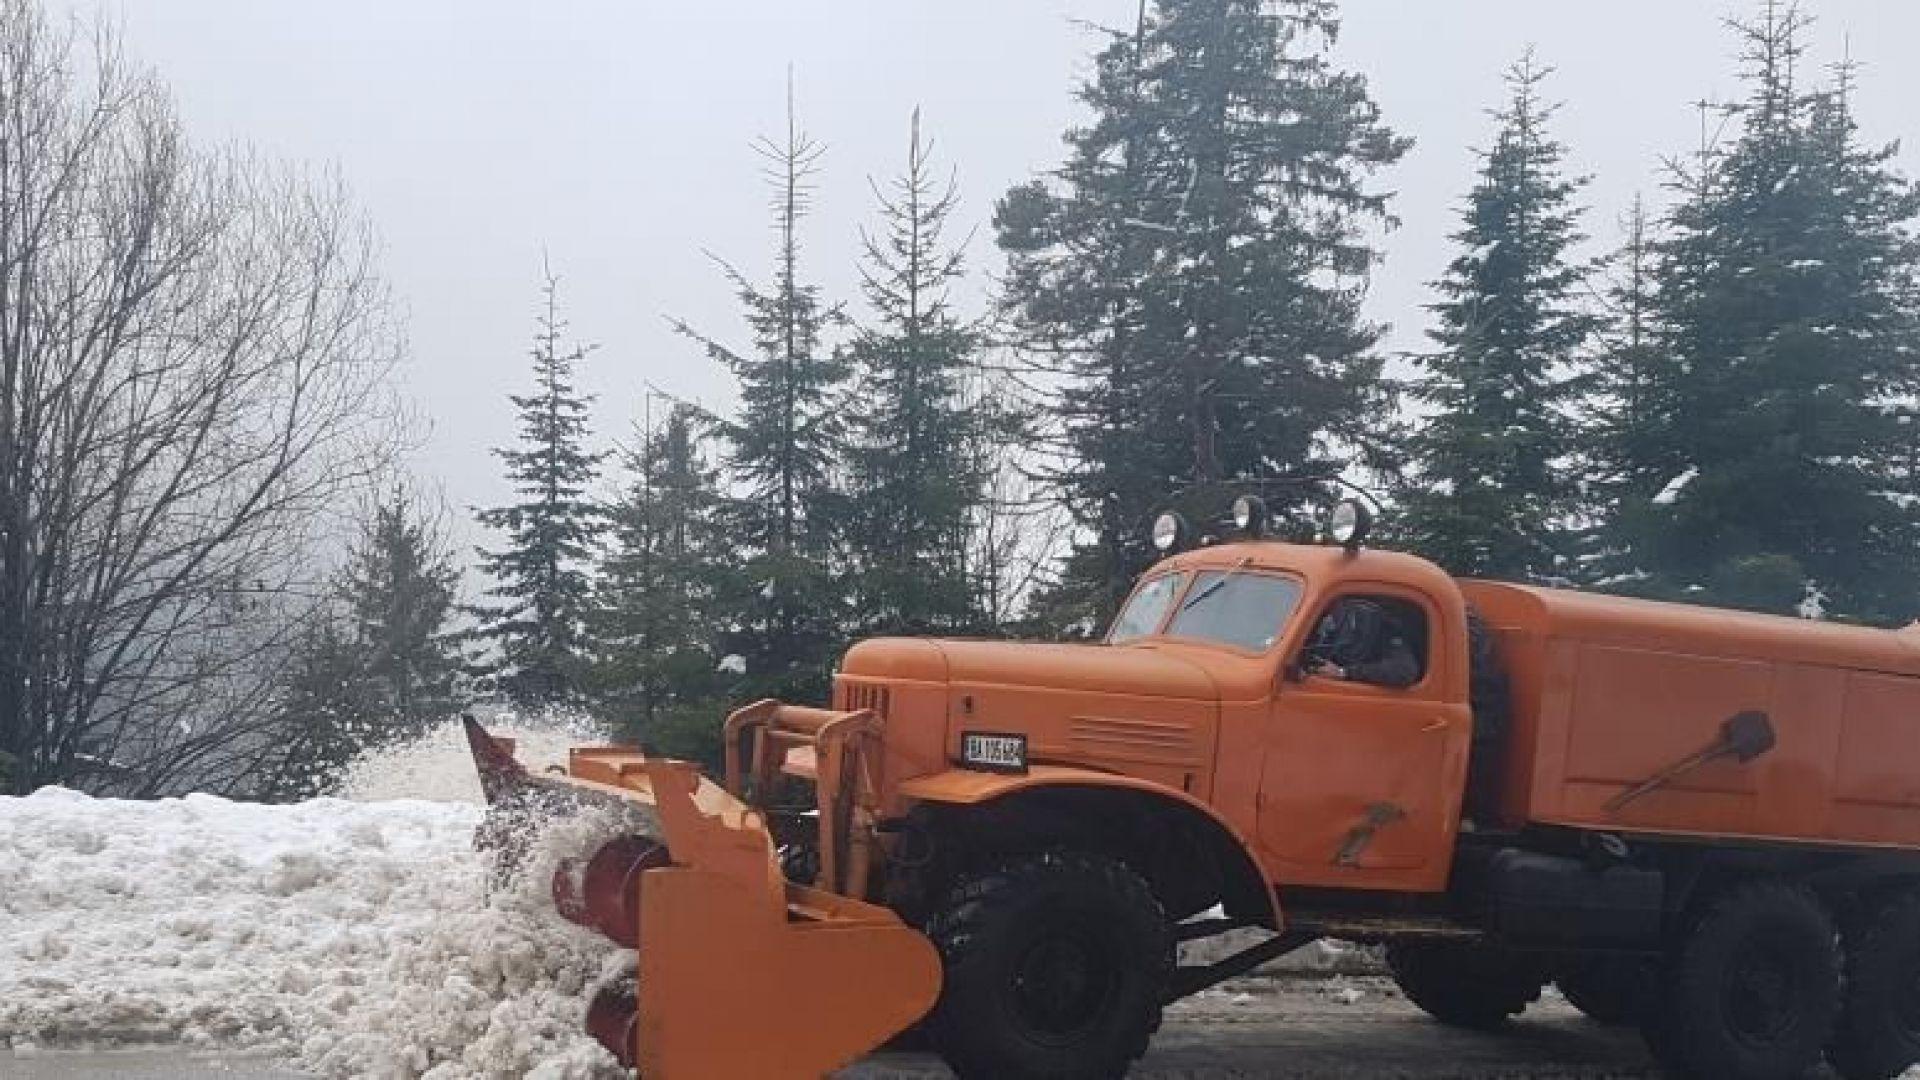 60 см сняг затвори прохода Превала, военни помагат в чистенето